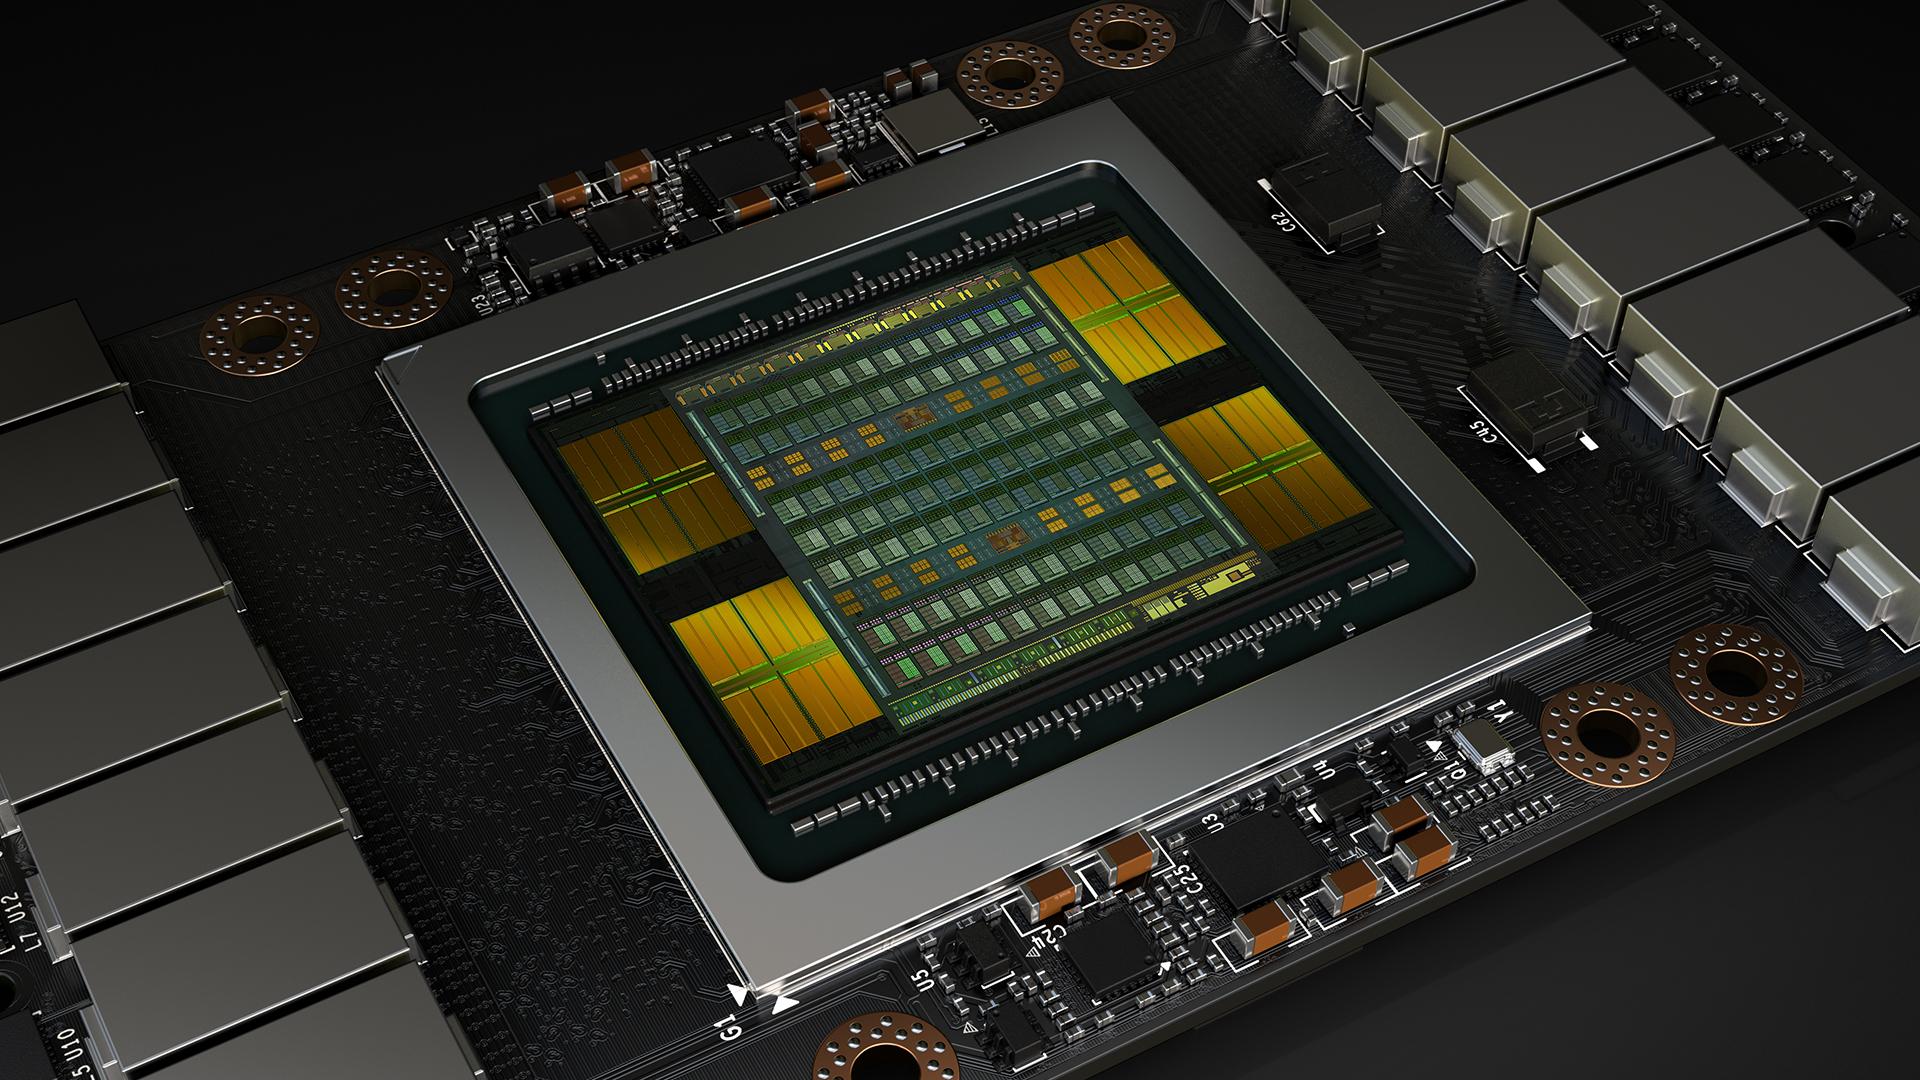 Nvidia CEO Huang: Big Data, Self-Driven Cars, Gaming the 'Big Vectors'